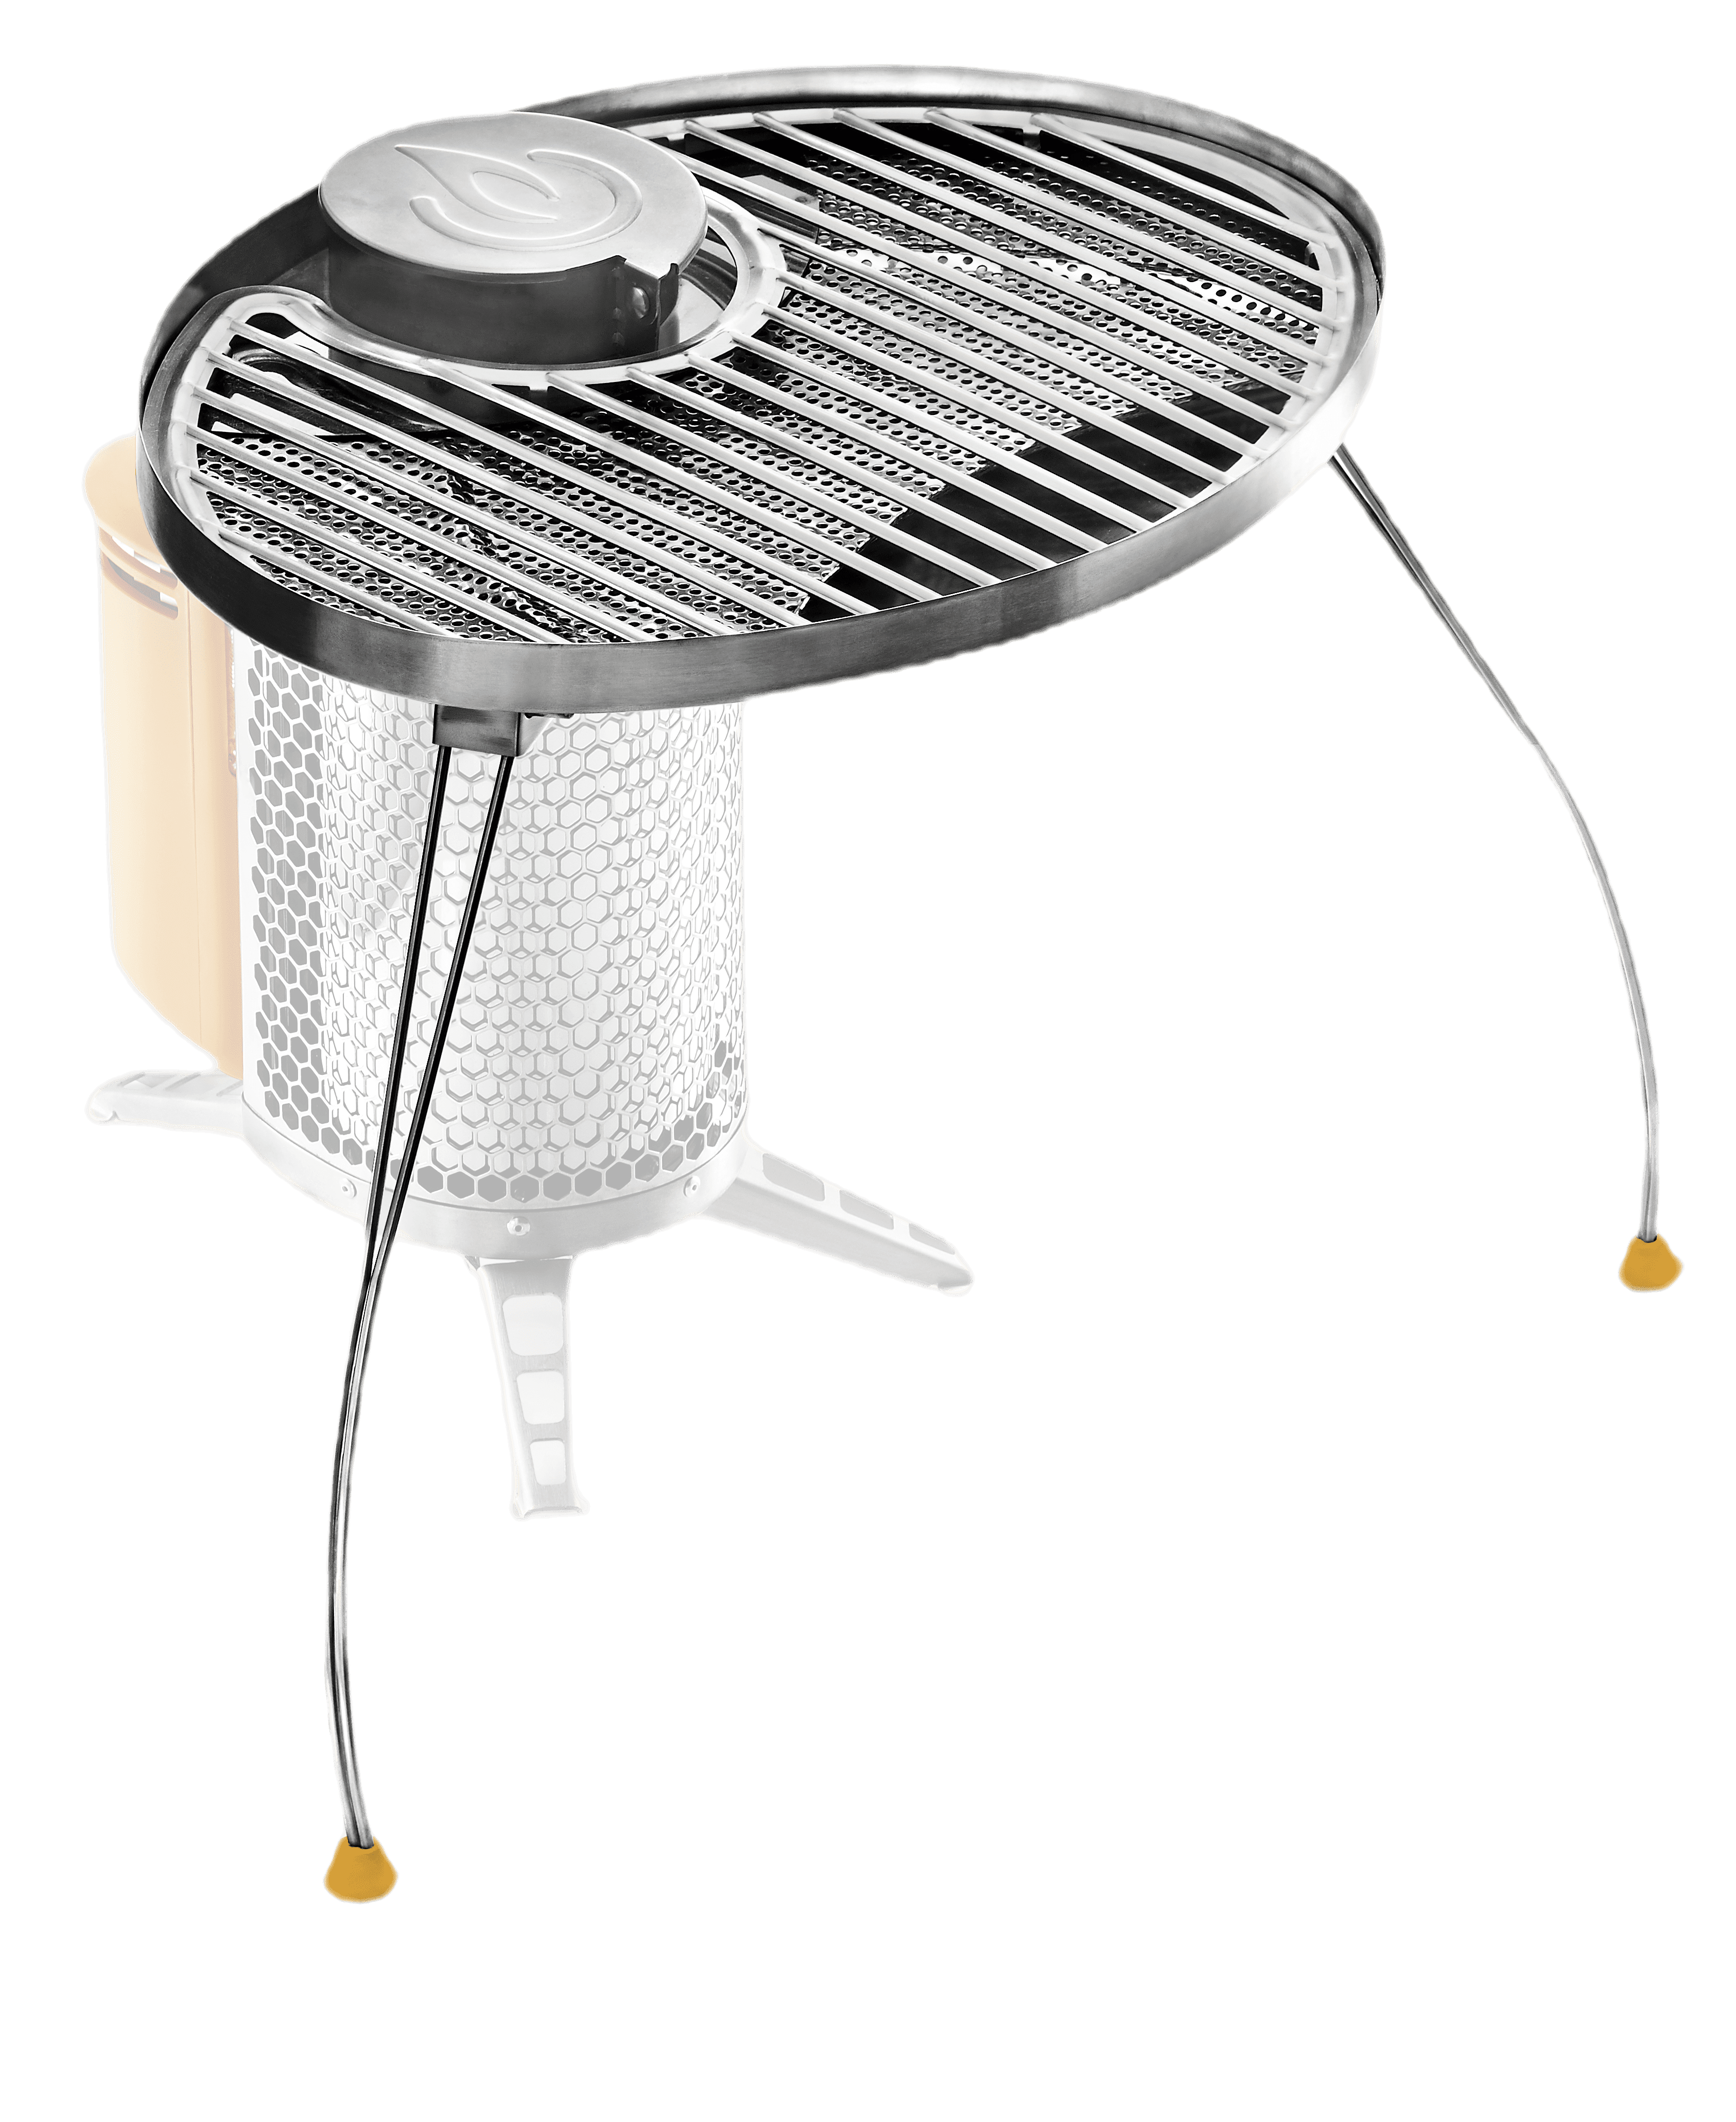 Campstove portable grill